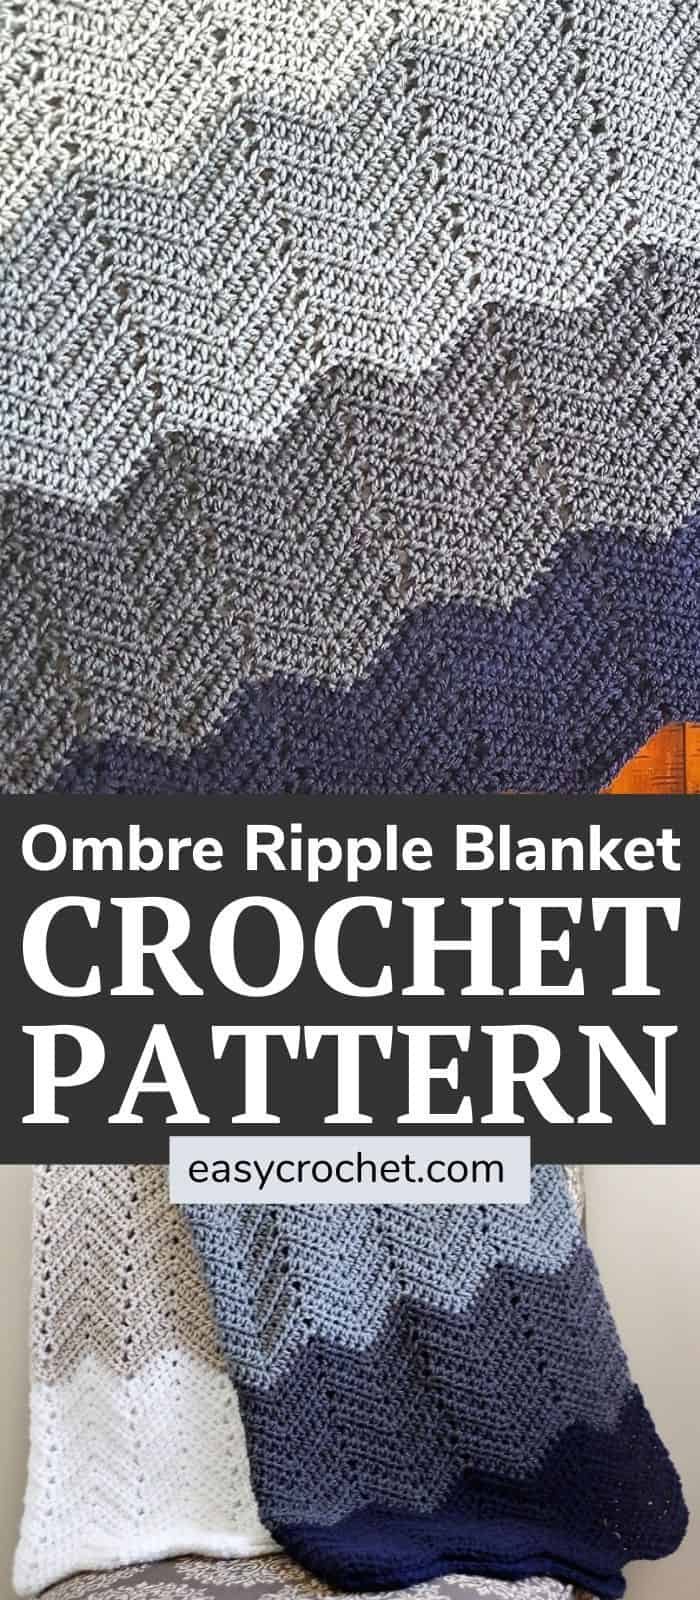 Crochet this easy ombre ripple blanket with this FREE crochet blanket pattern from Easy Crochet via @easycrochetcom